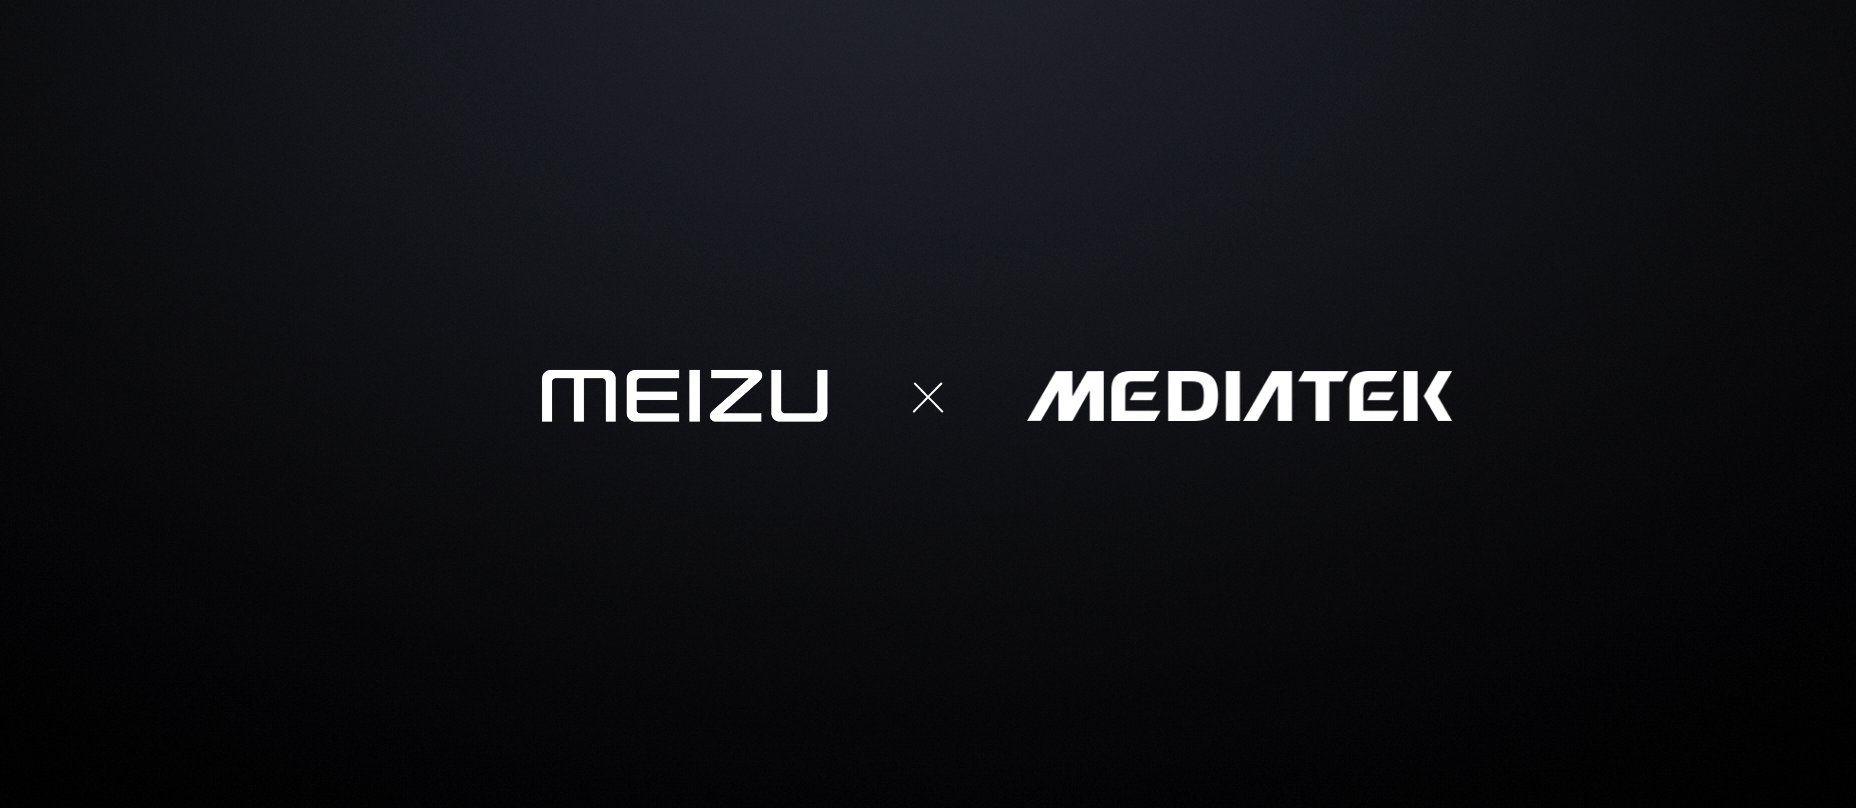 MEIZUはMediaTekと共に顔認証システムを開発することを発表